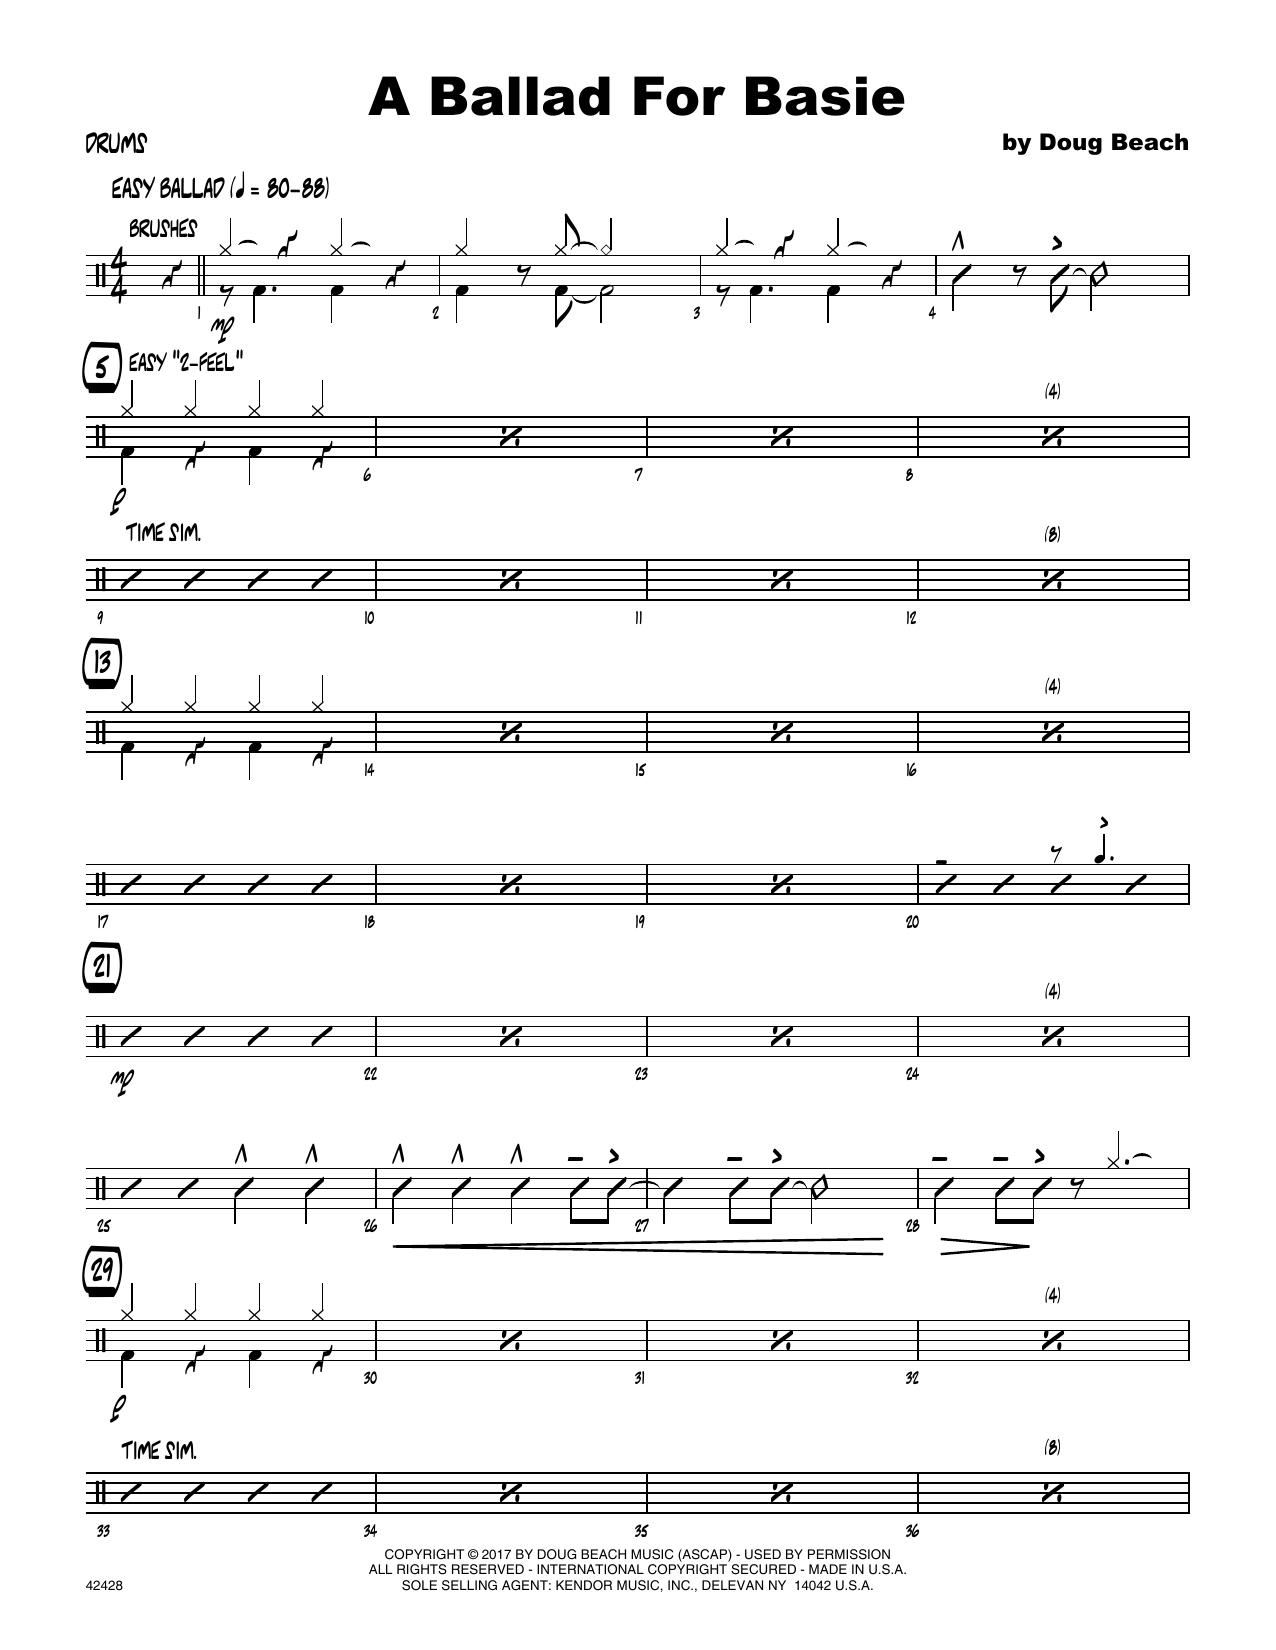 A Ballad For Basie - Drum Set Sheet Music